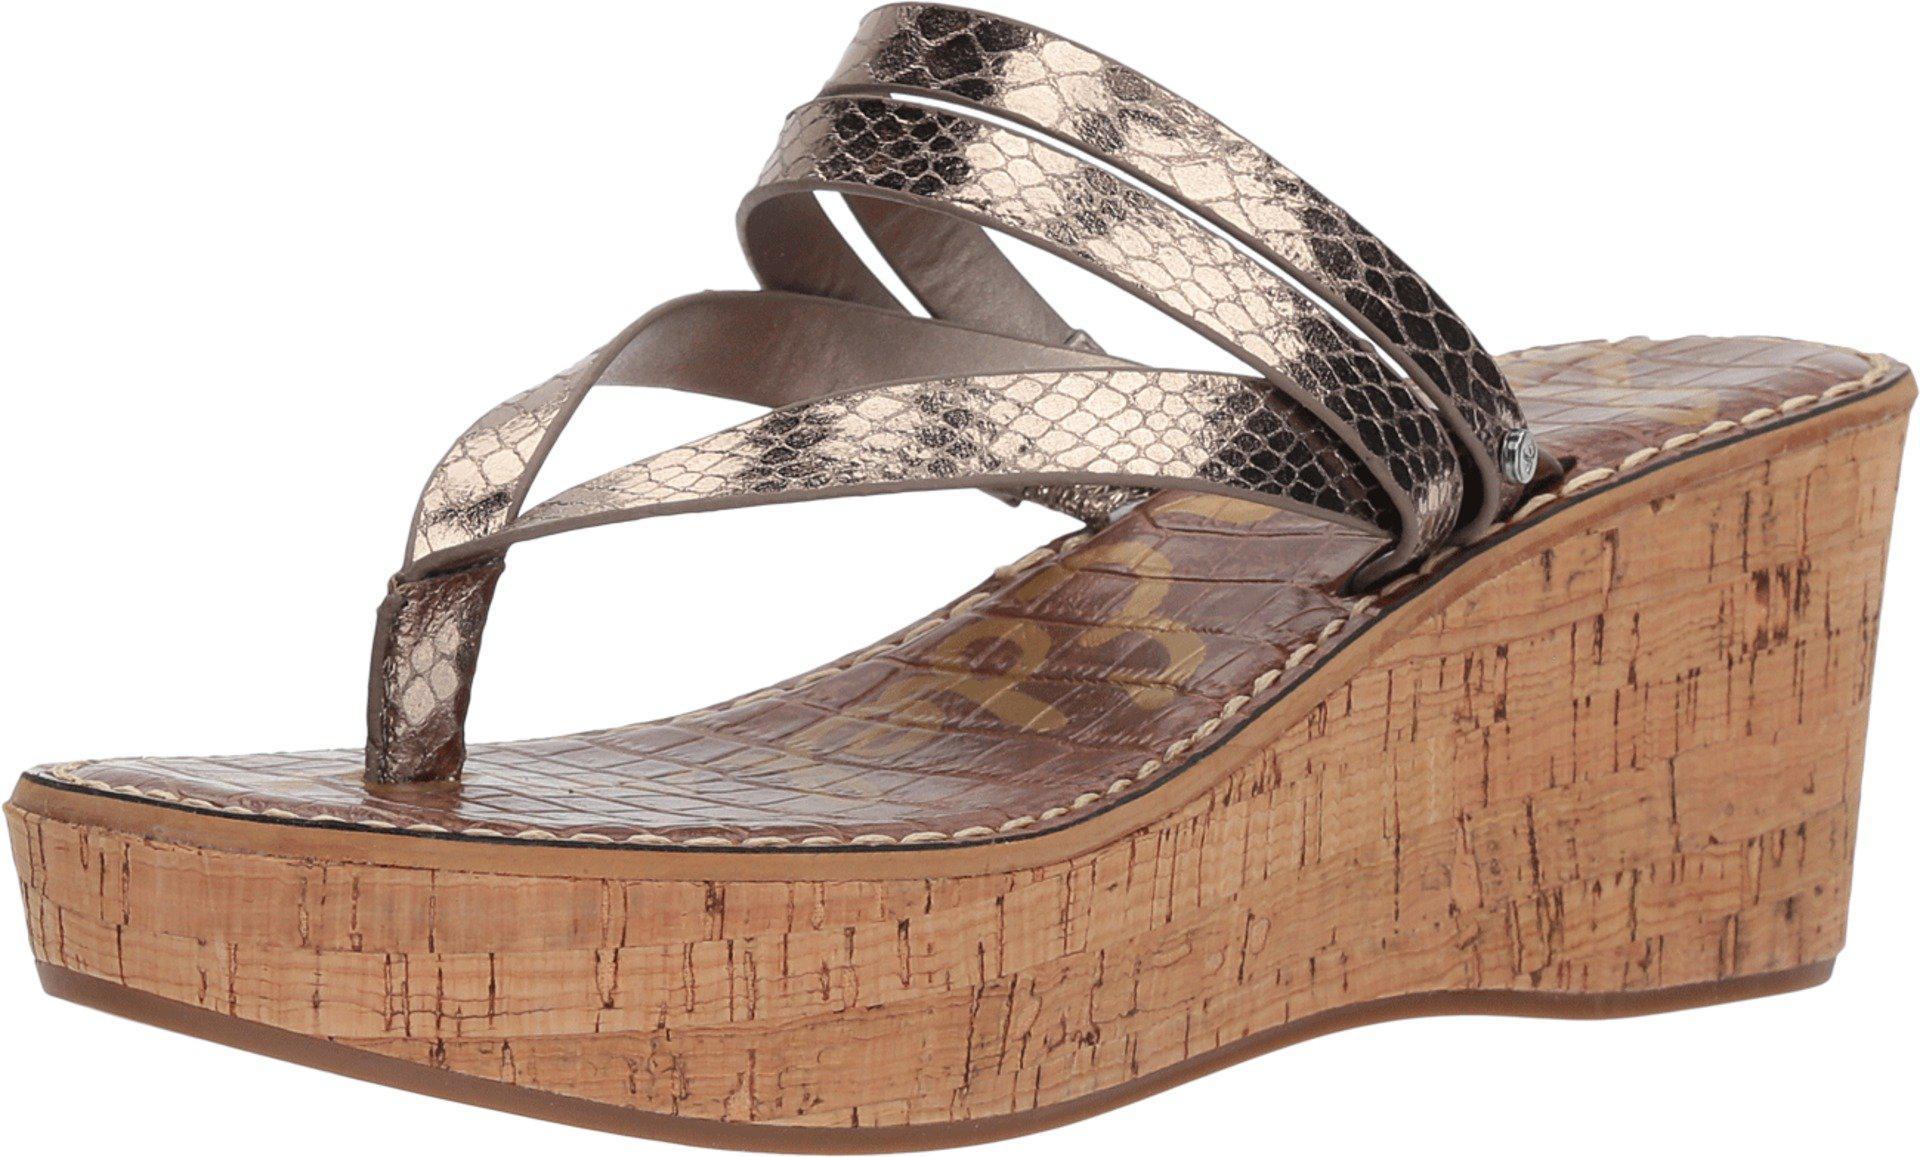 Sam Edelman Rasha Nubuck Thong Wedge Sandals 8RPYRVmX6